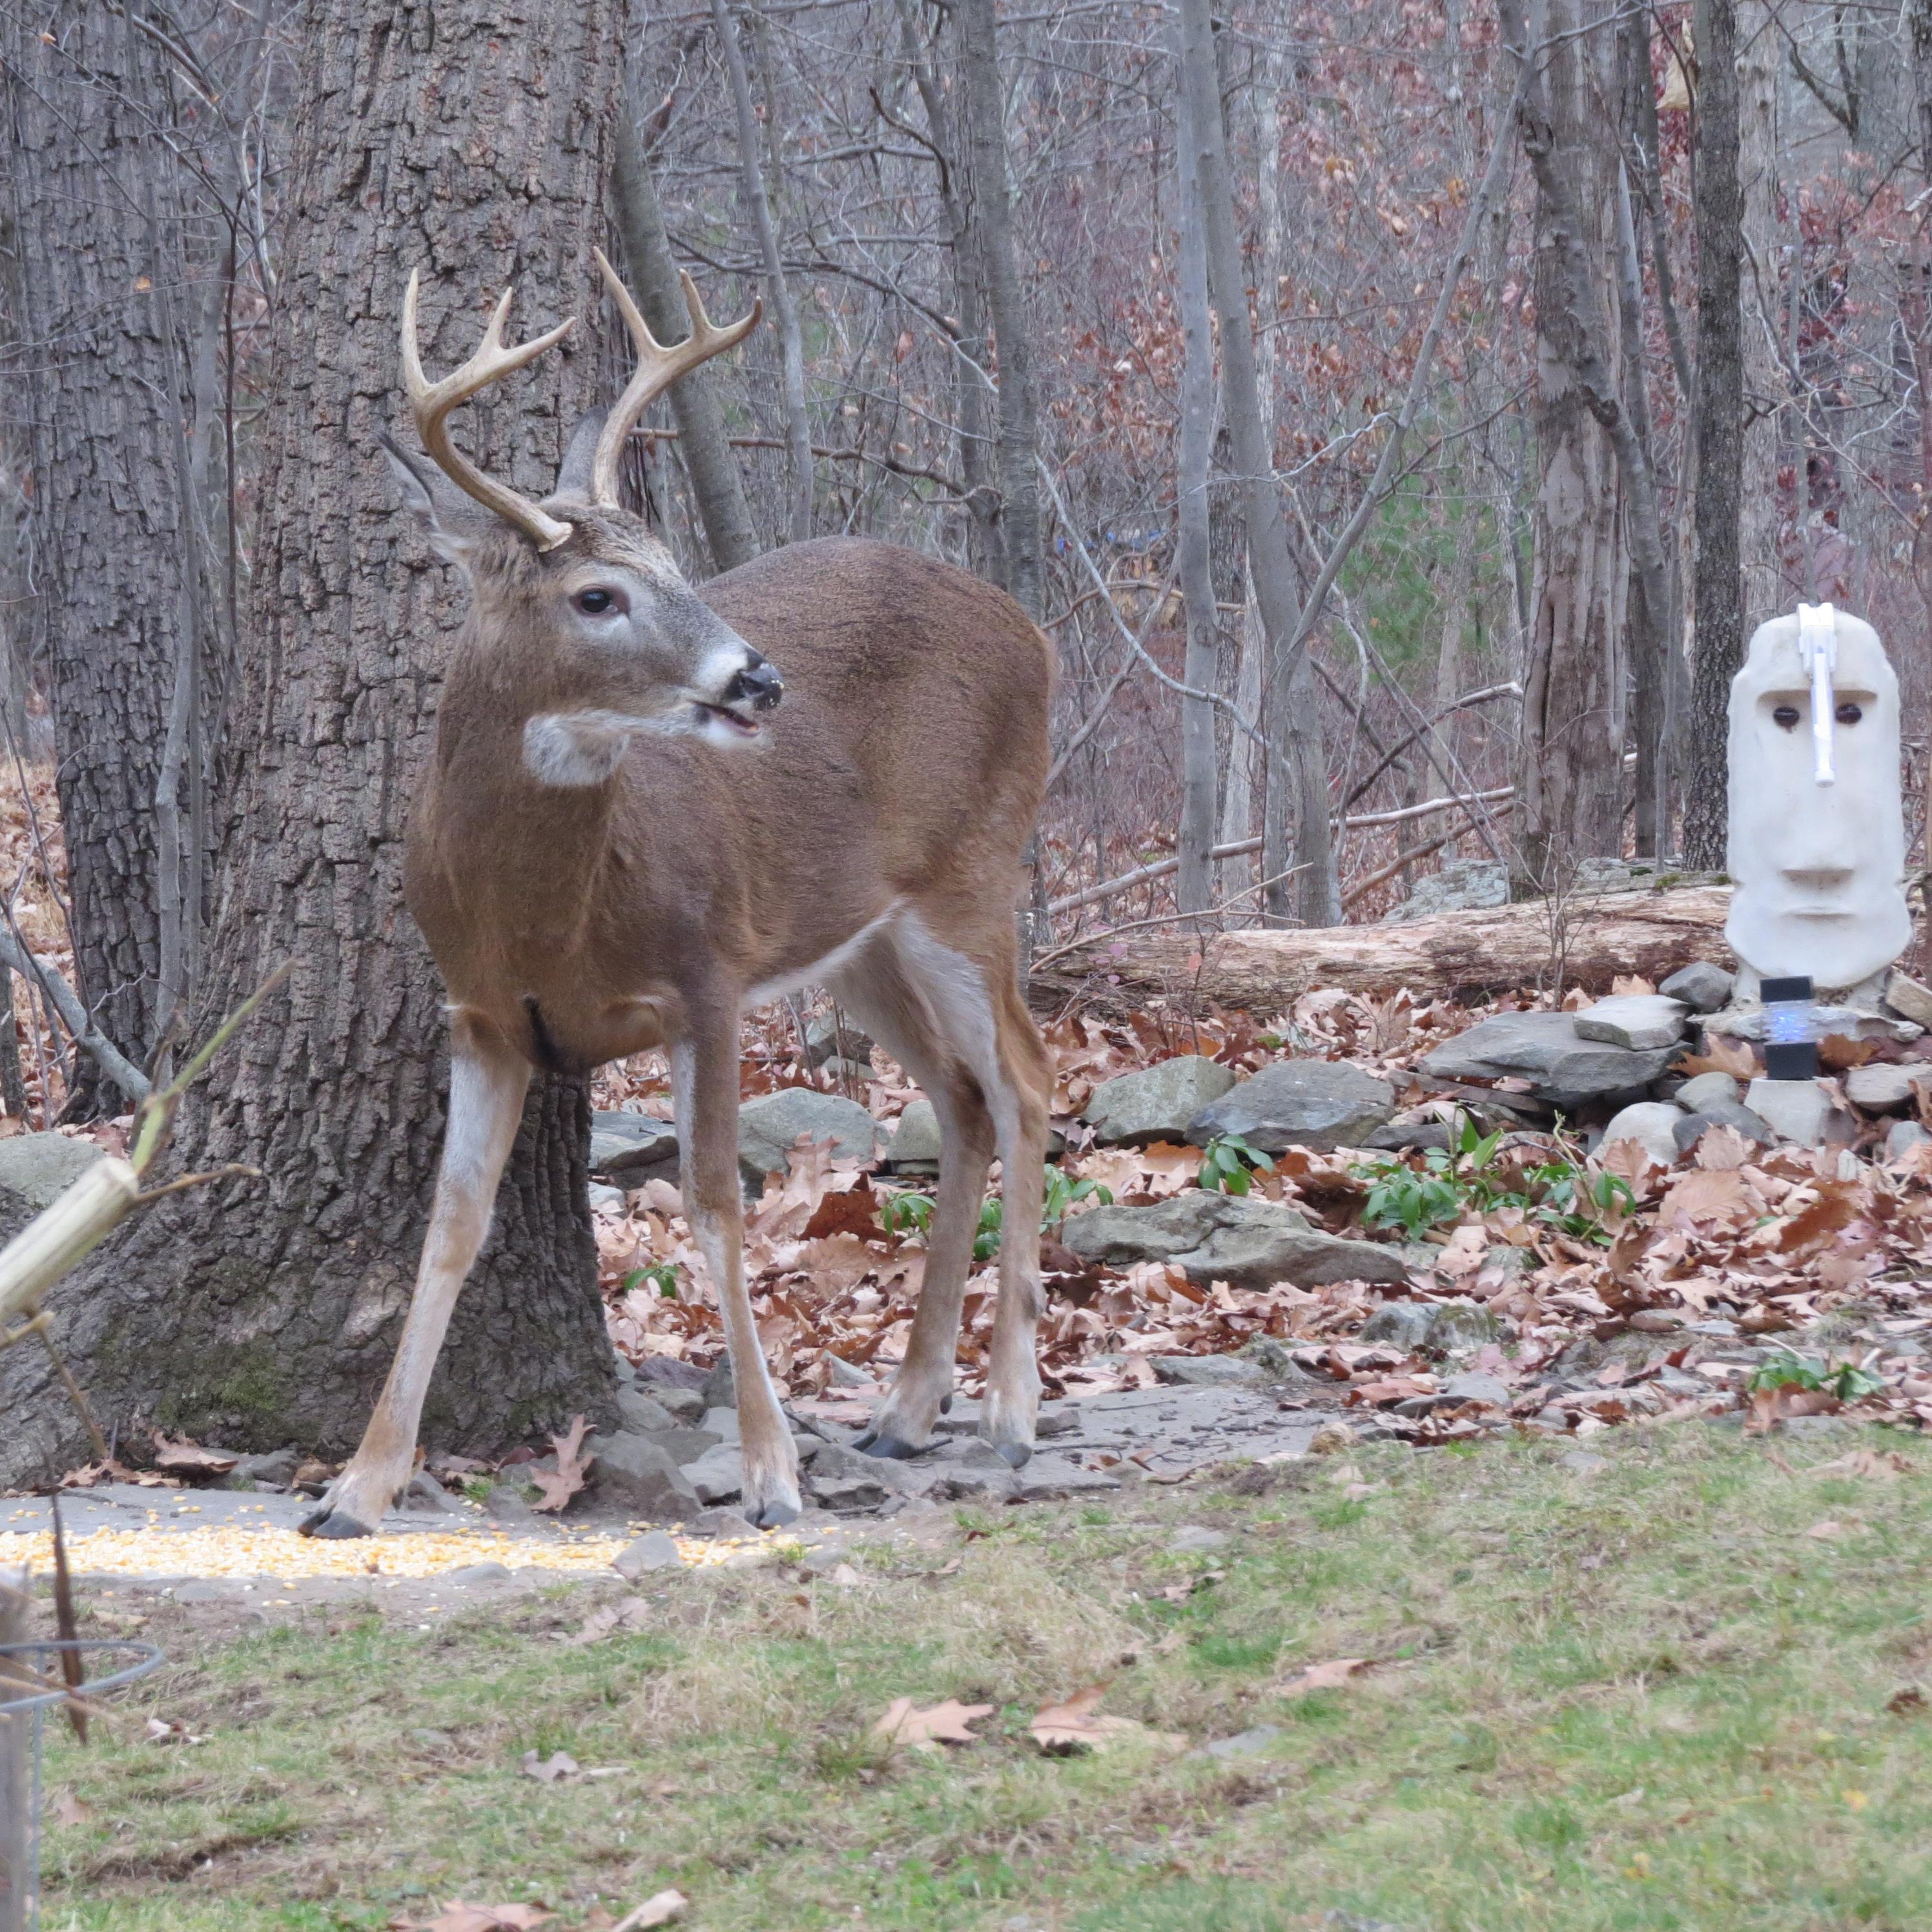 Deer Mating Season | harmonicimagery's Blog